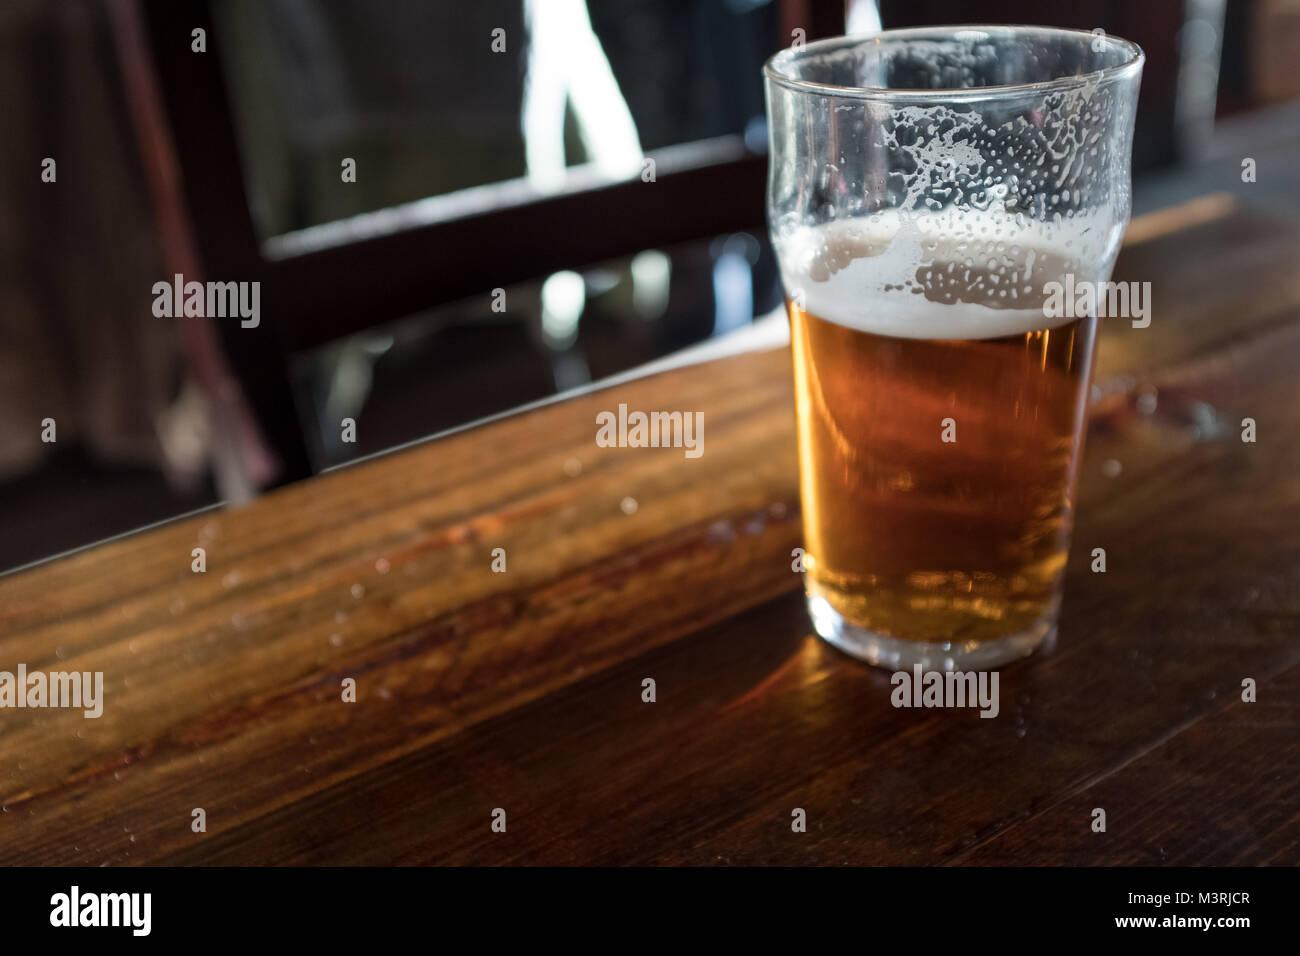 Half full pint of beer on pub table - Stock Image